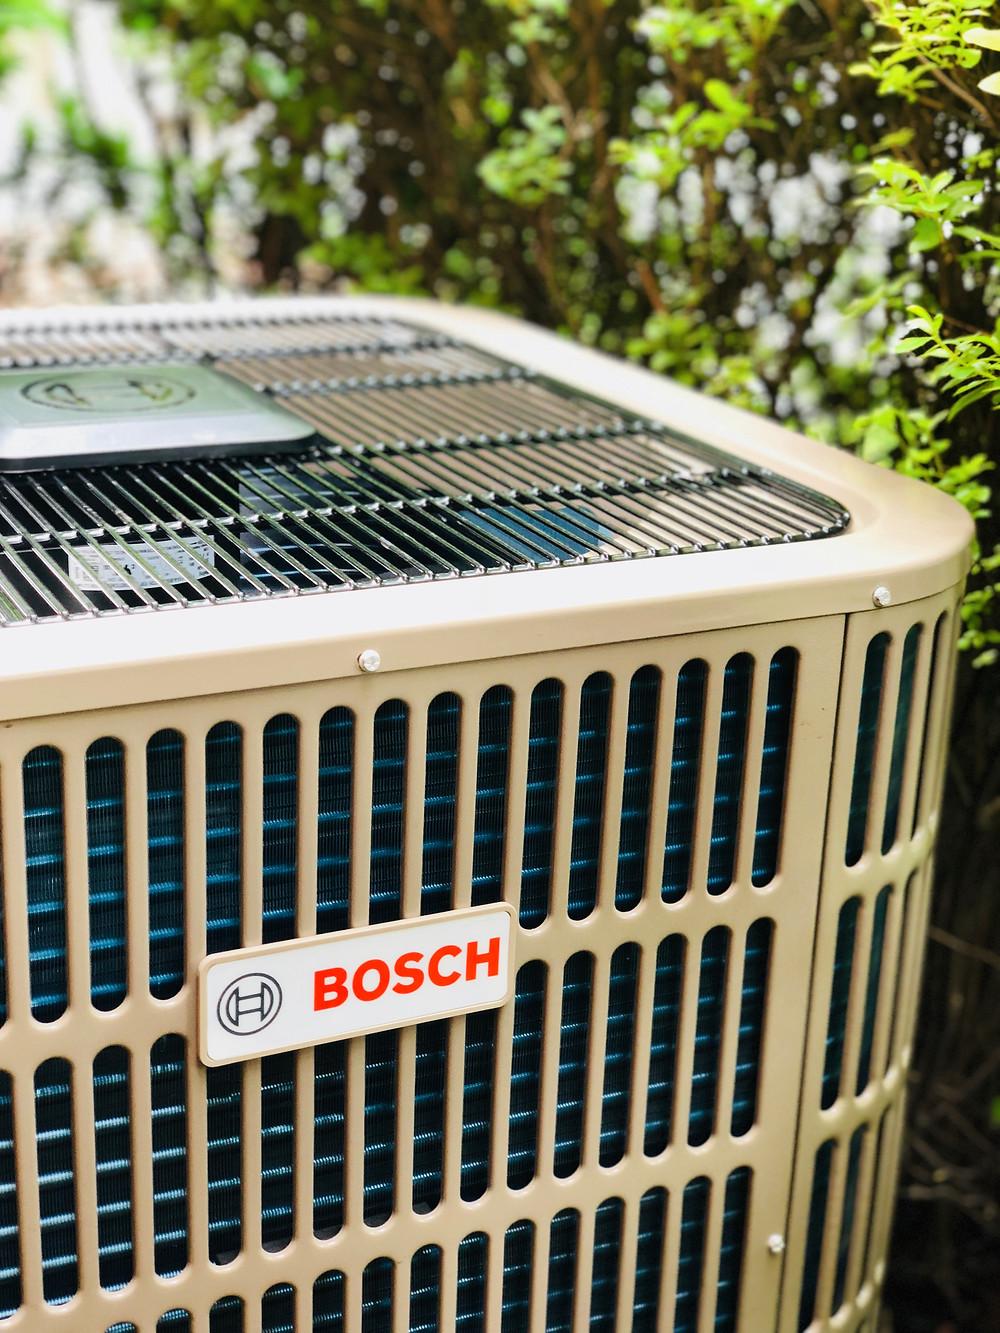 BOSCH introduced their Inverter Heat Pump system last year.